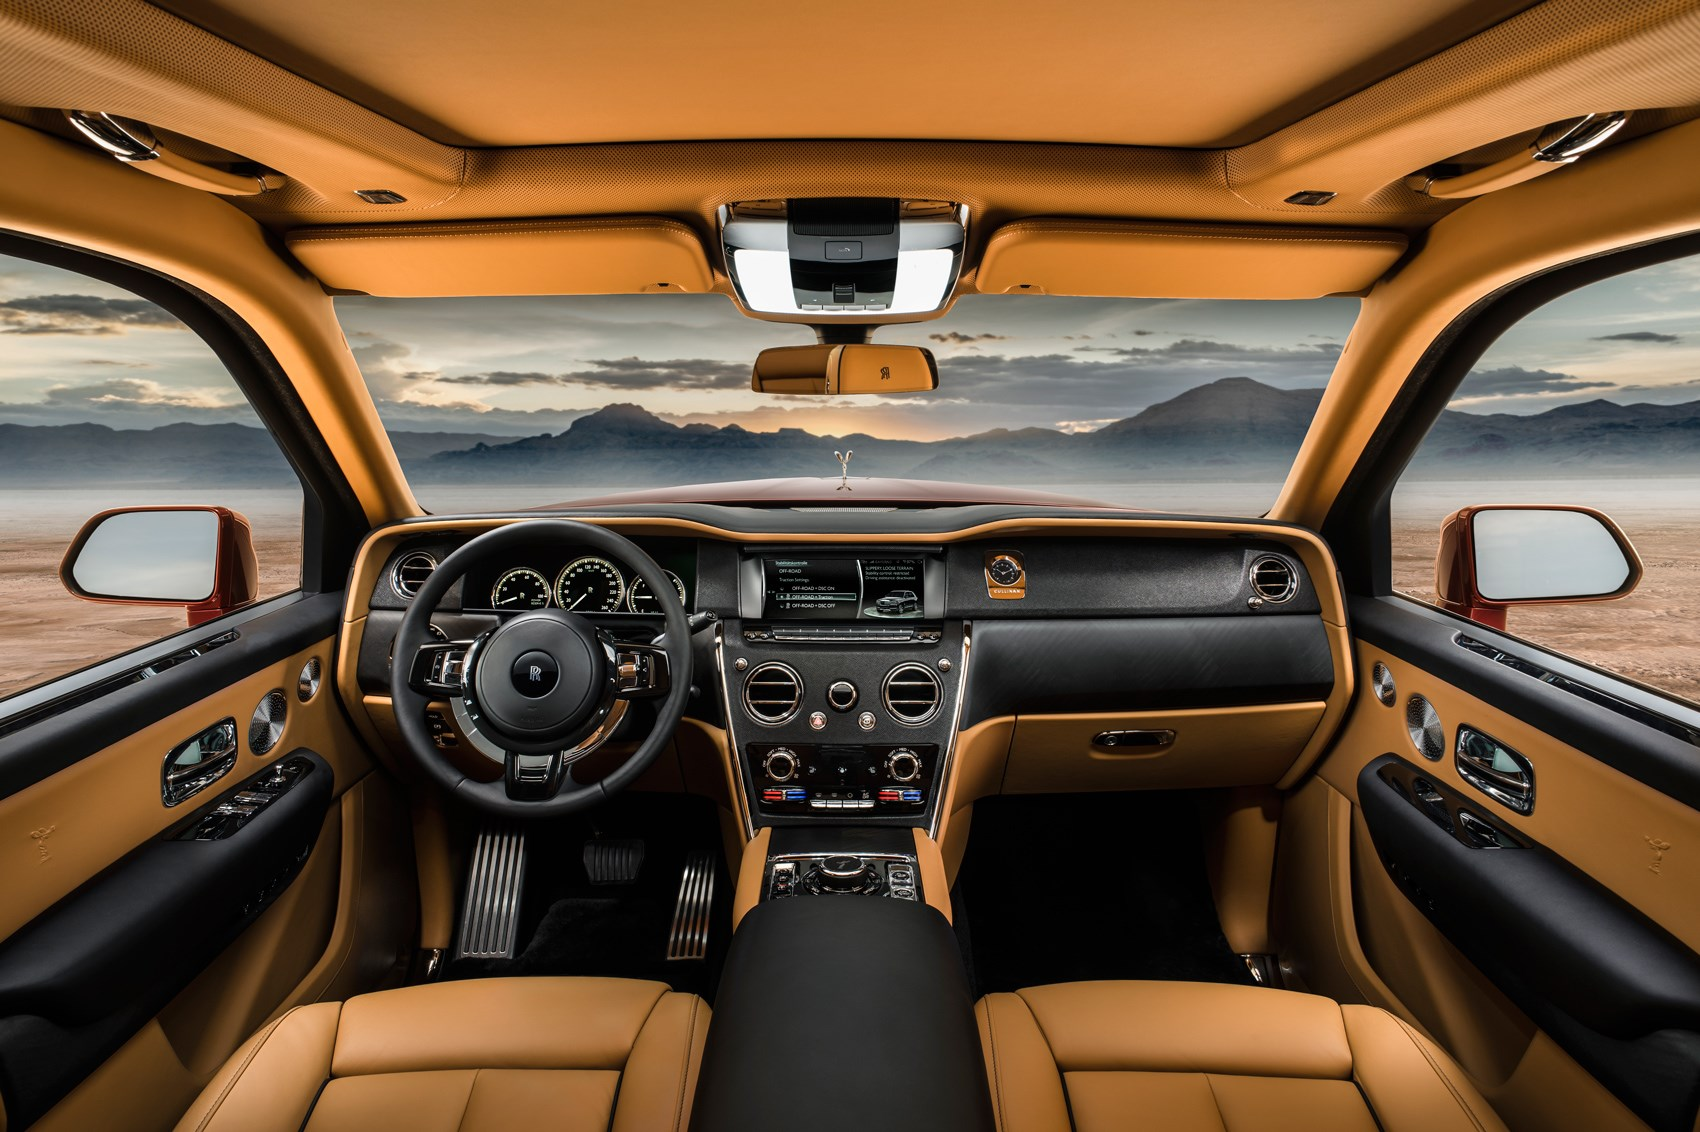 New Rolls Royce Cullinan Suv Gavin Green S Take On The Uber